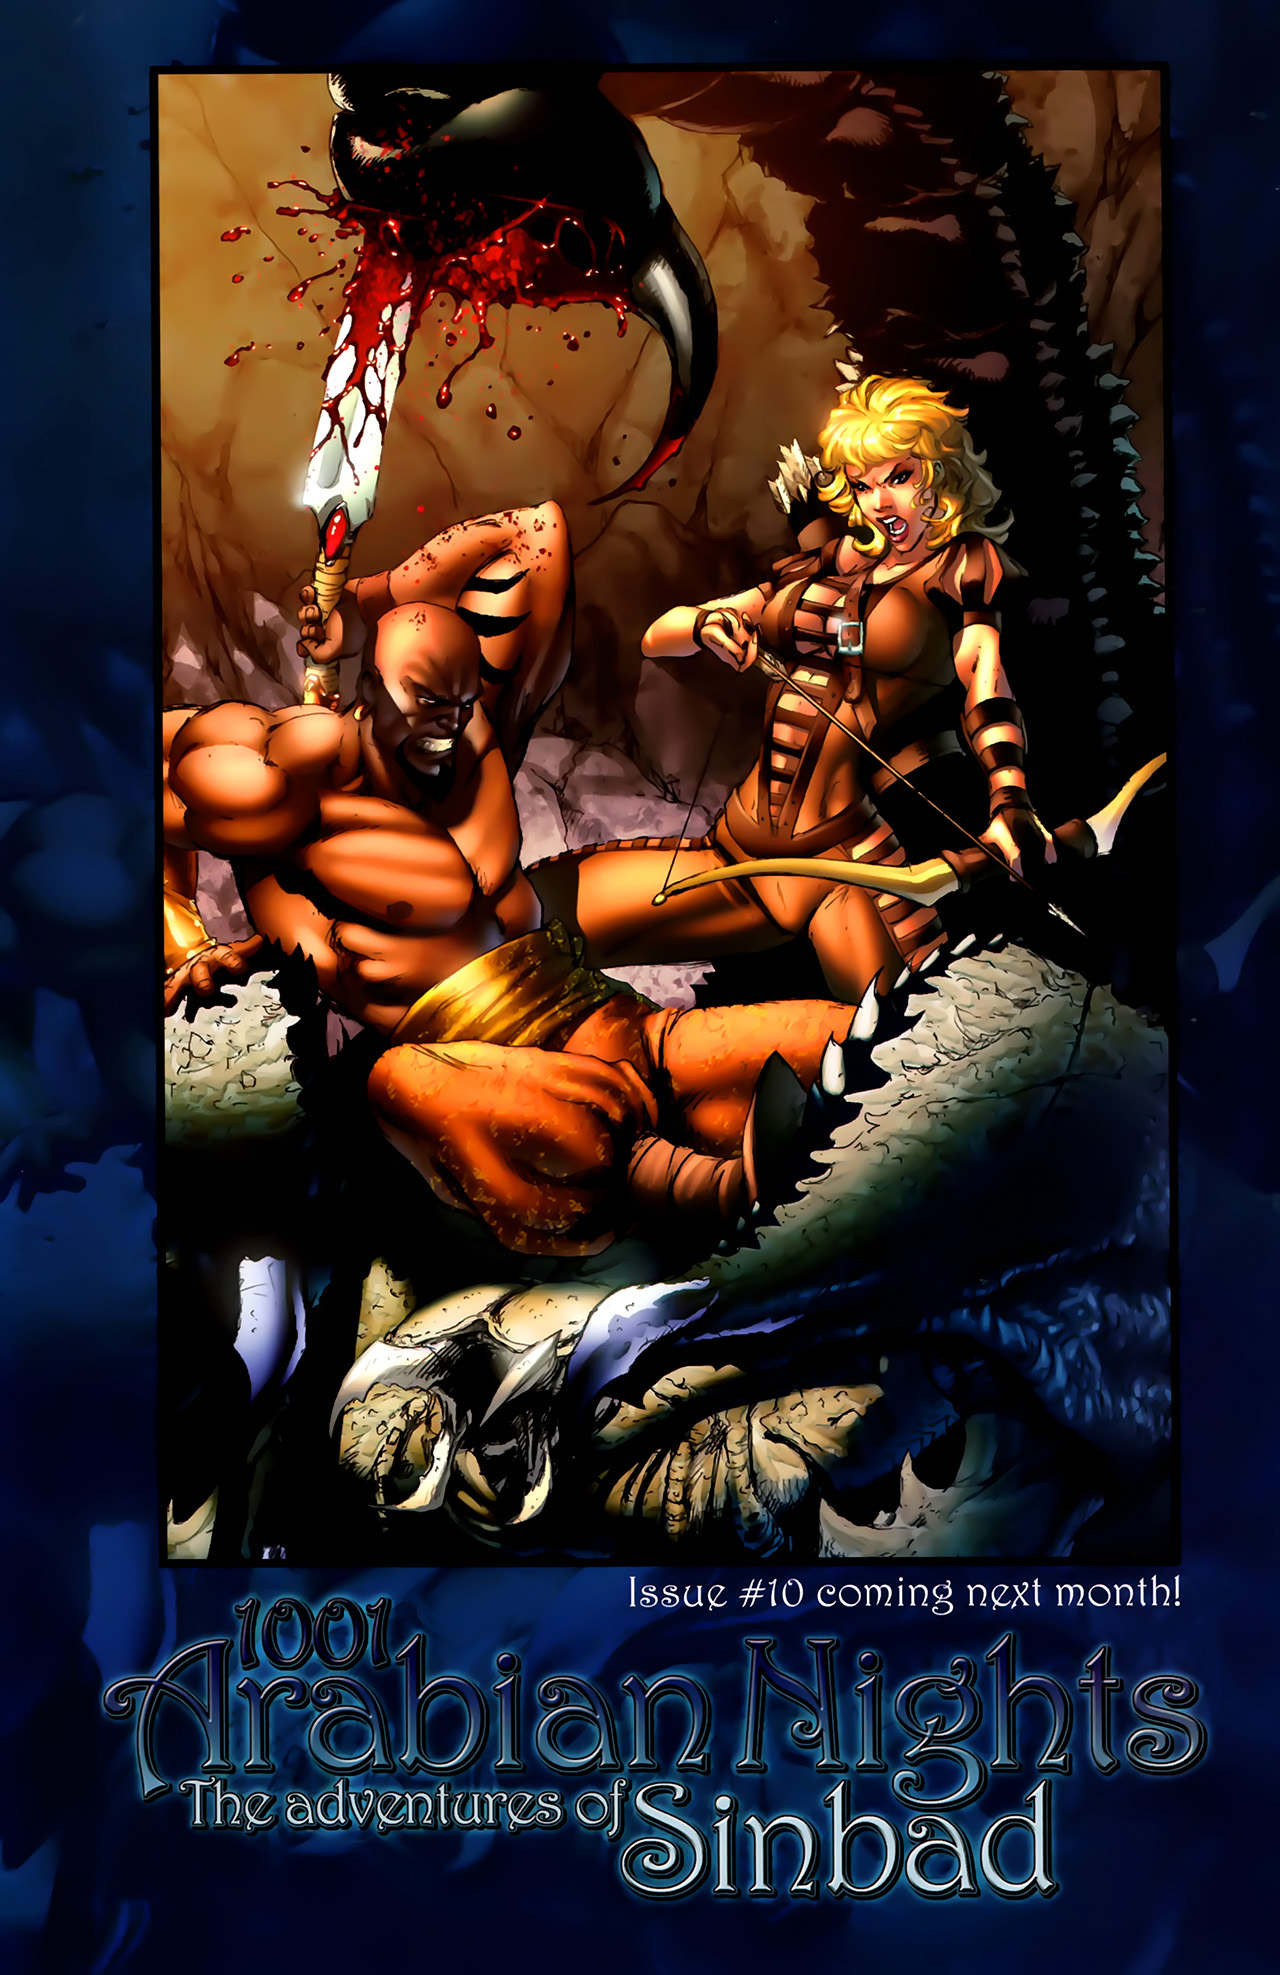 Read online 1001 Arabian Nights: The Adventures of Sinbad comic -  Issue #9 - 25